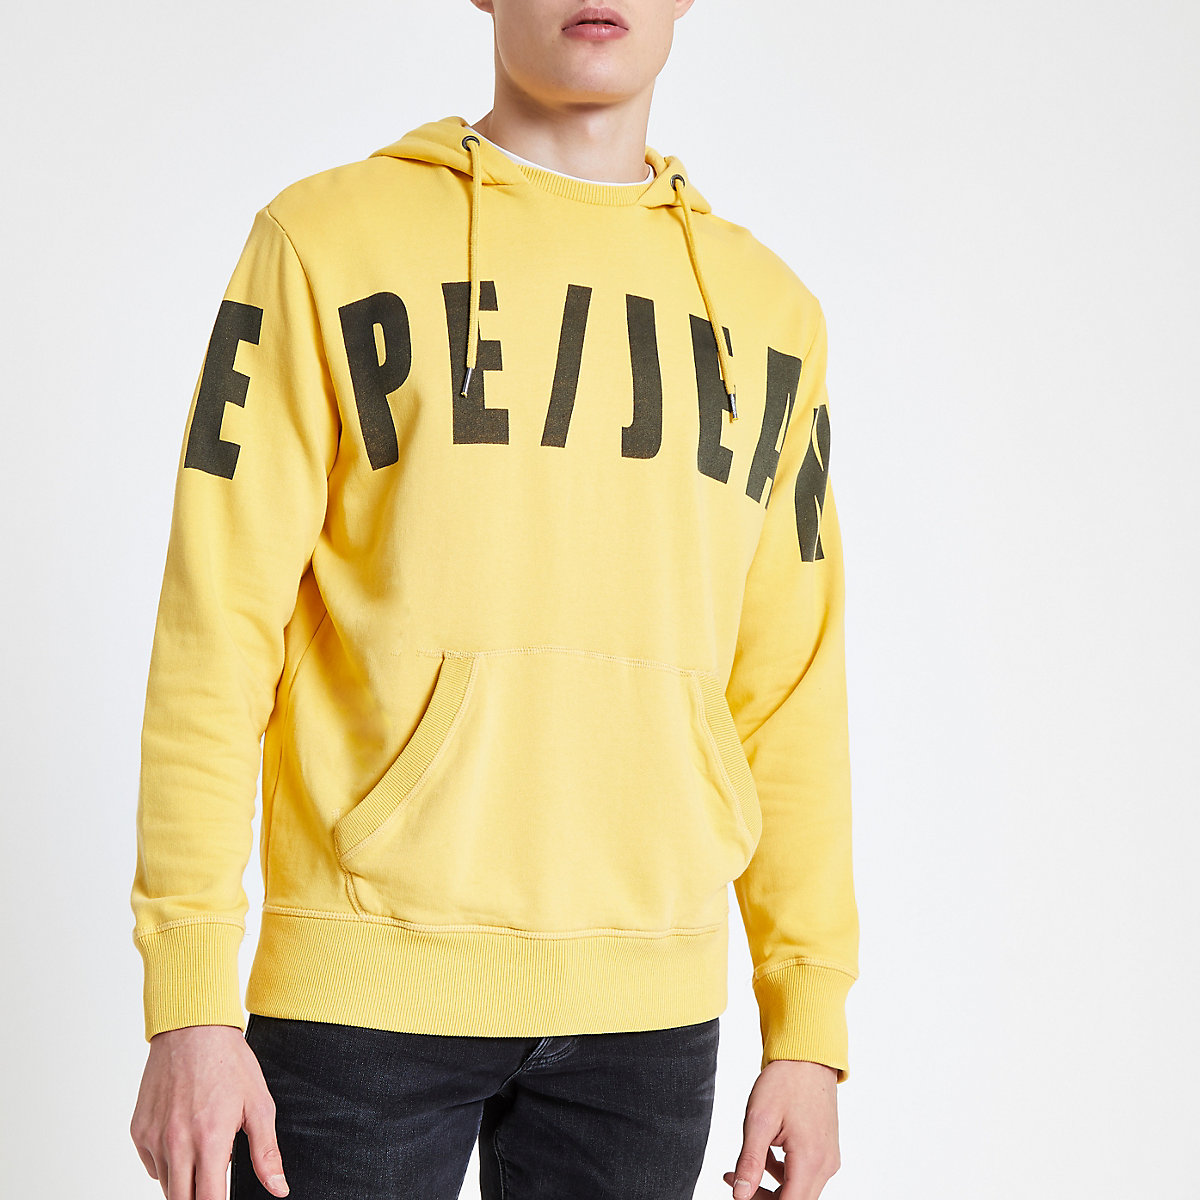 Pepe Jeans yellow hoodie